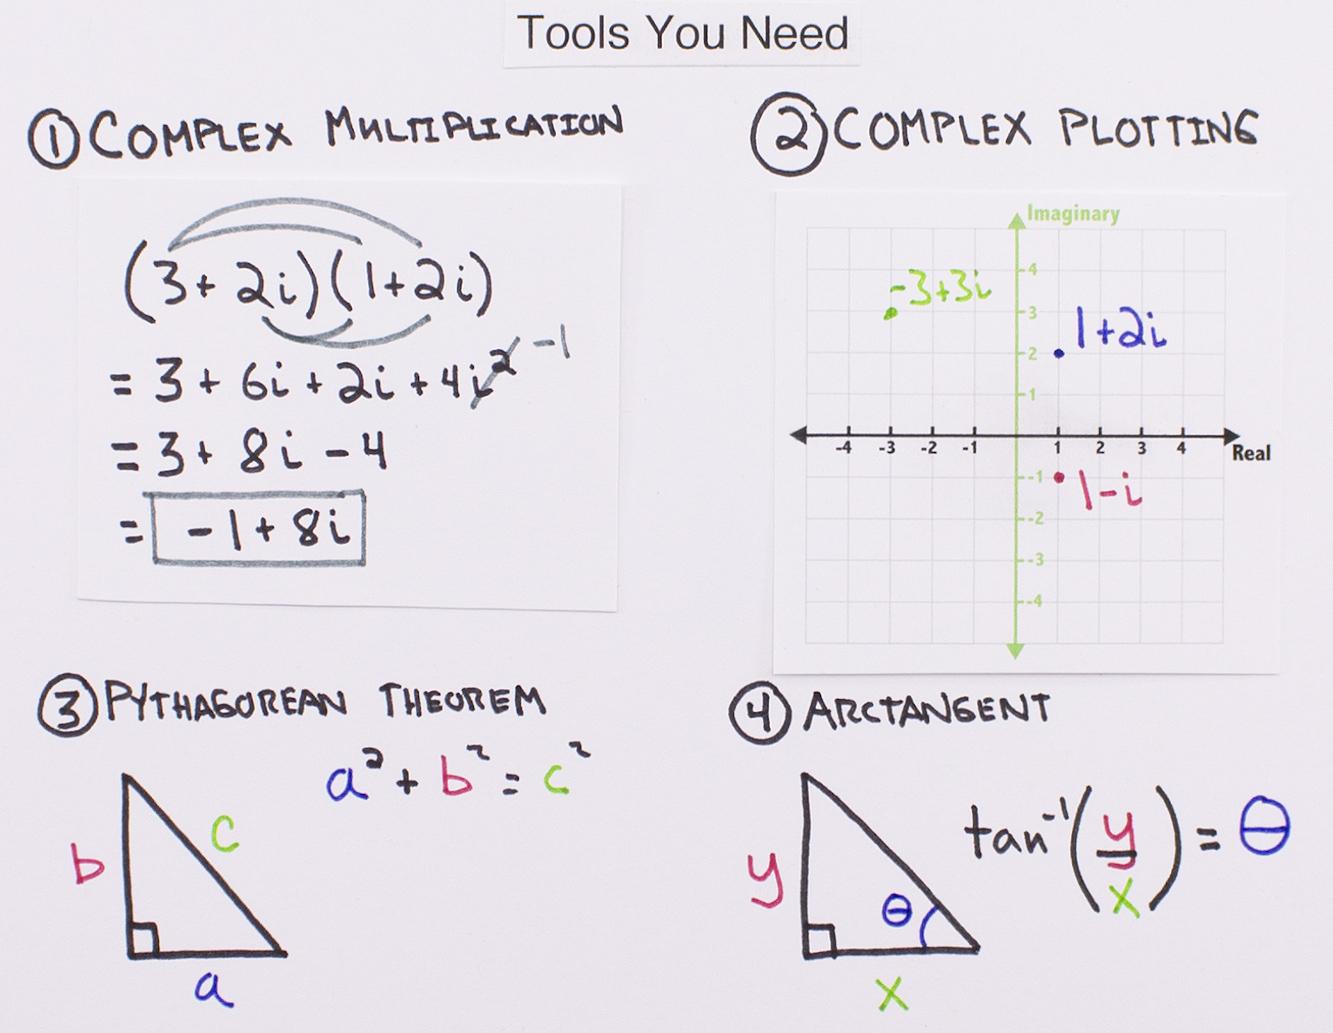 Figure 1. Tools you need.